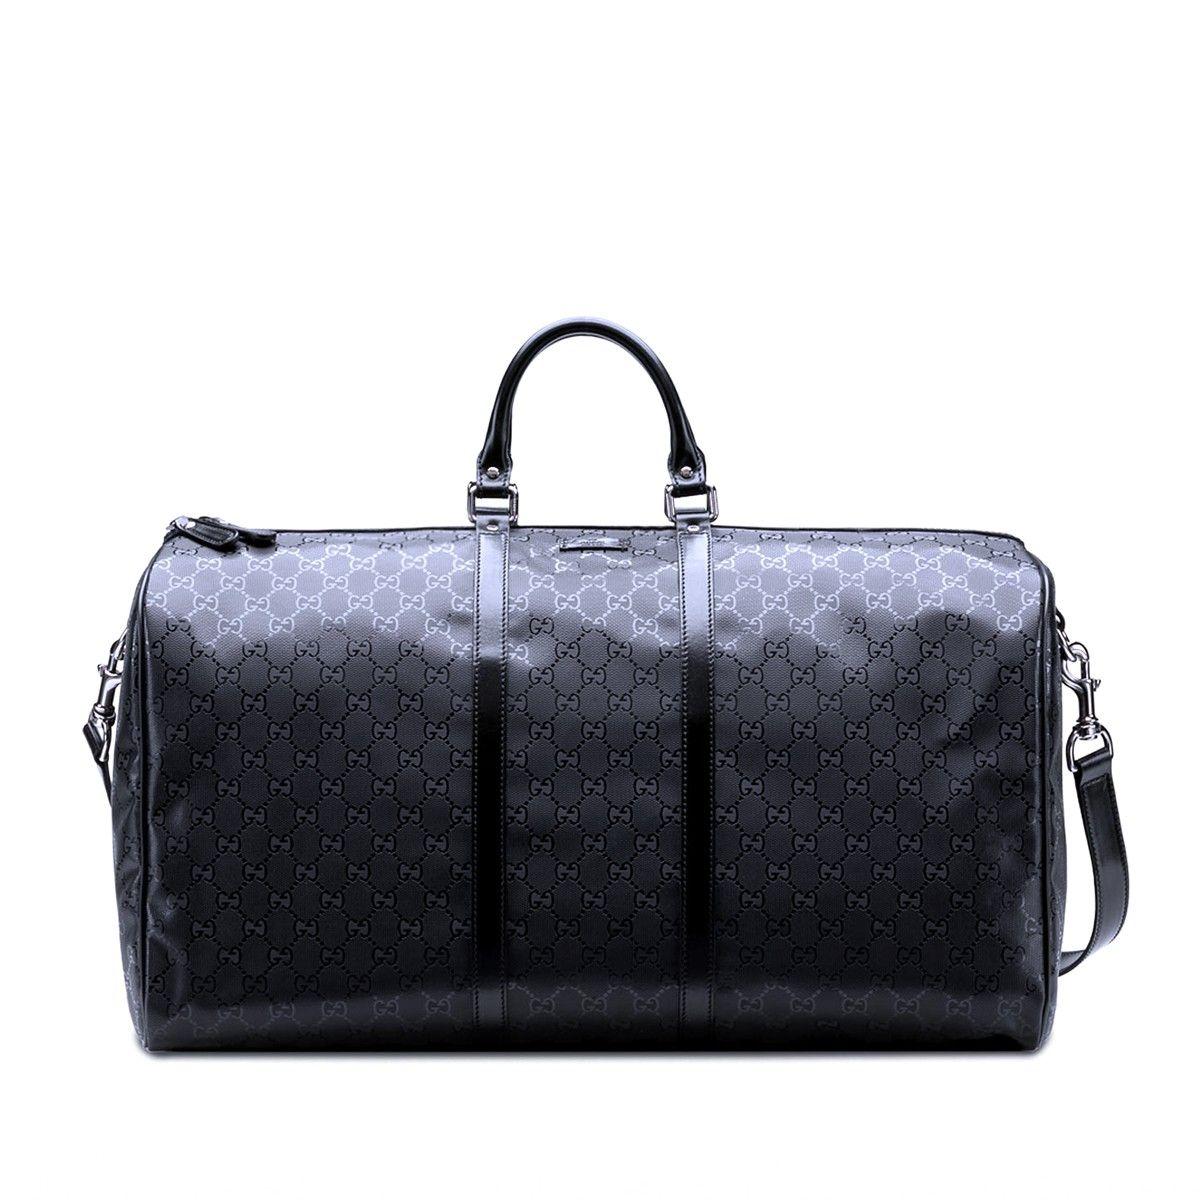 c92c2a7940f0 Gucci black large GG imprime duffle | Replica Cheap Handbags | Gucci ...